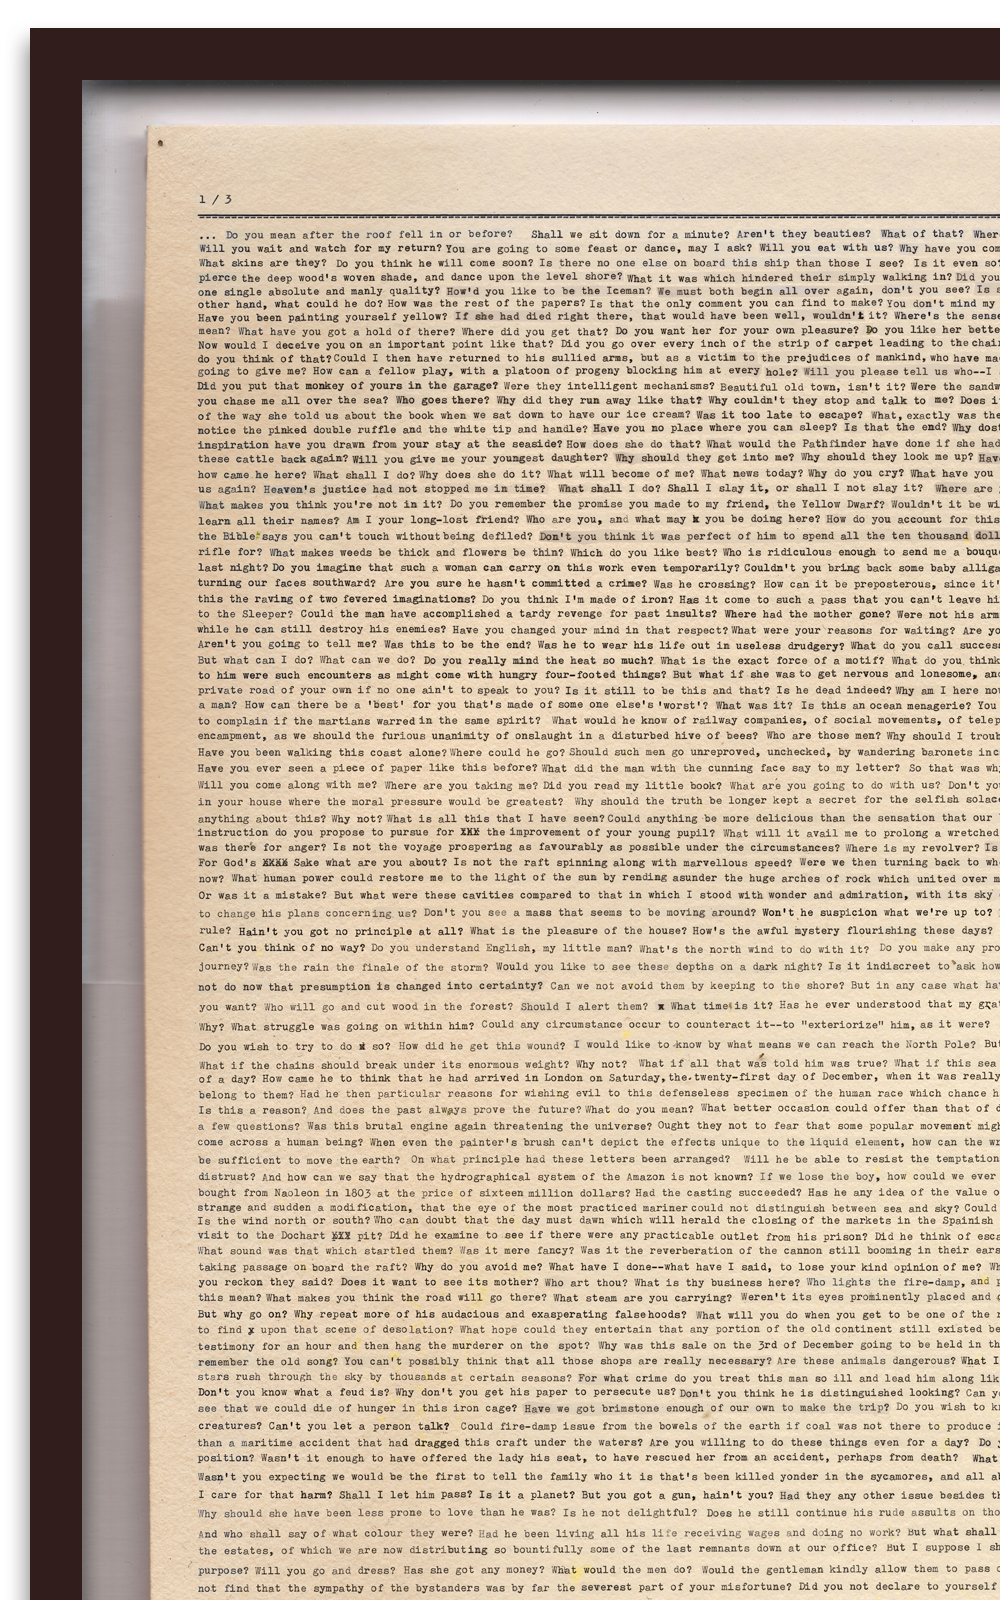 Case Simmons, Simmons & Burke, Score Collage Poem #1, SMMoA, Santa Monica Museum of Art,Digital Collage,Digital Art, Case Simmons Art, Text Art, Font Art, Typewriter Art, Photoshop Collage, Livrivox, Fiction Art, Internet Archive